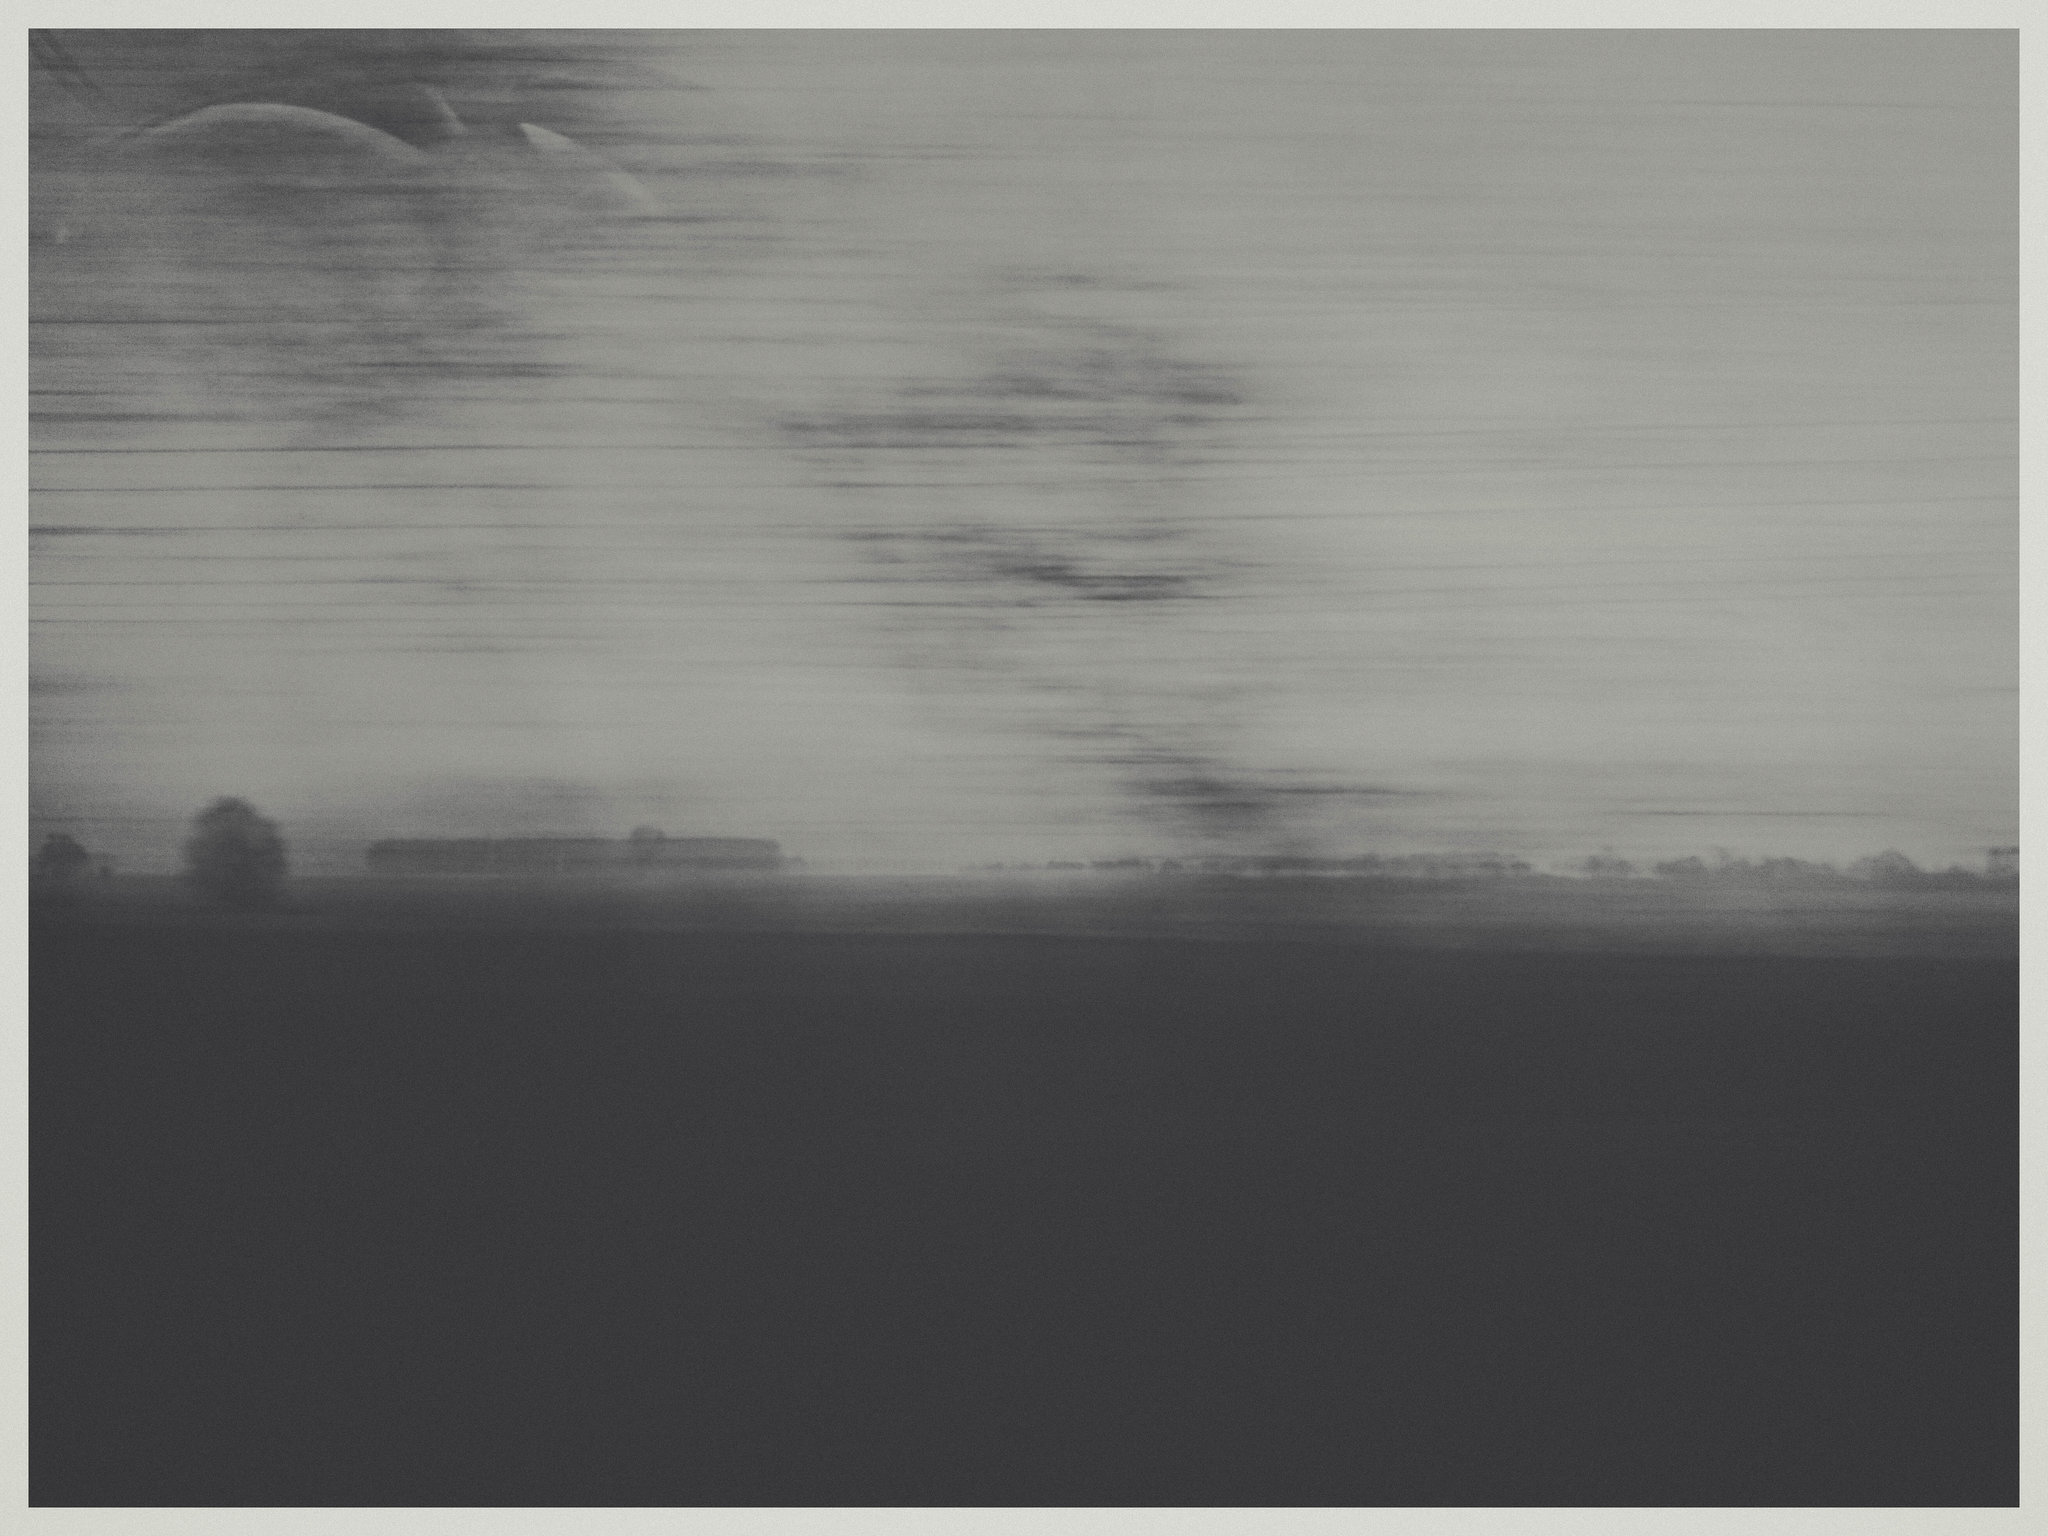 CameraZOOM-20150410064058080.jpg